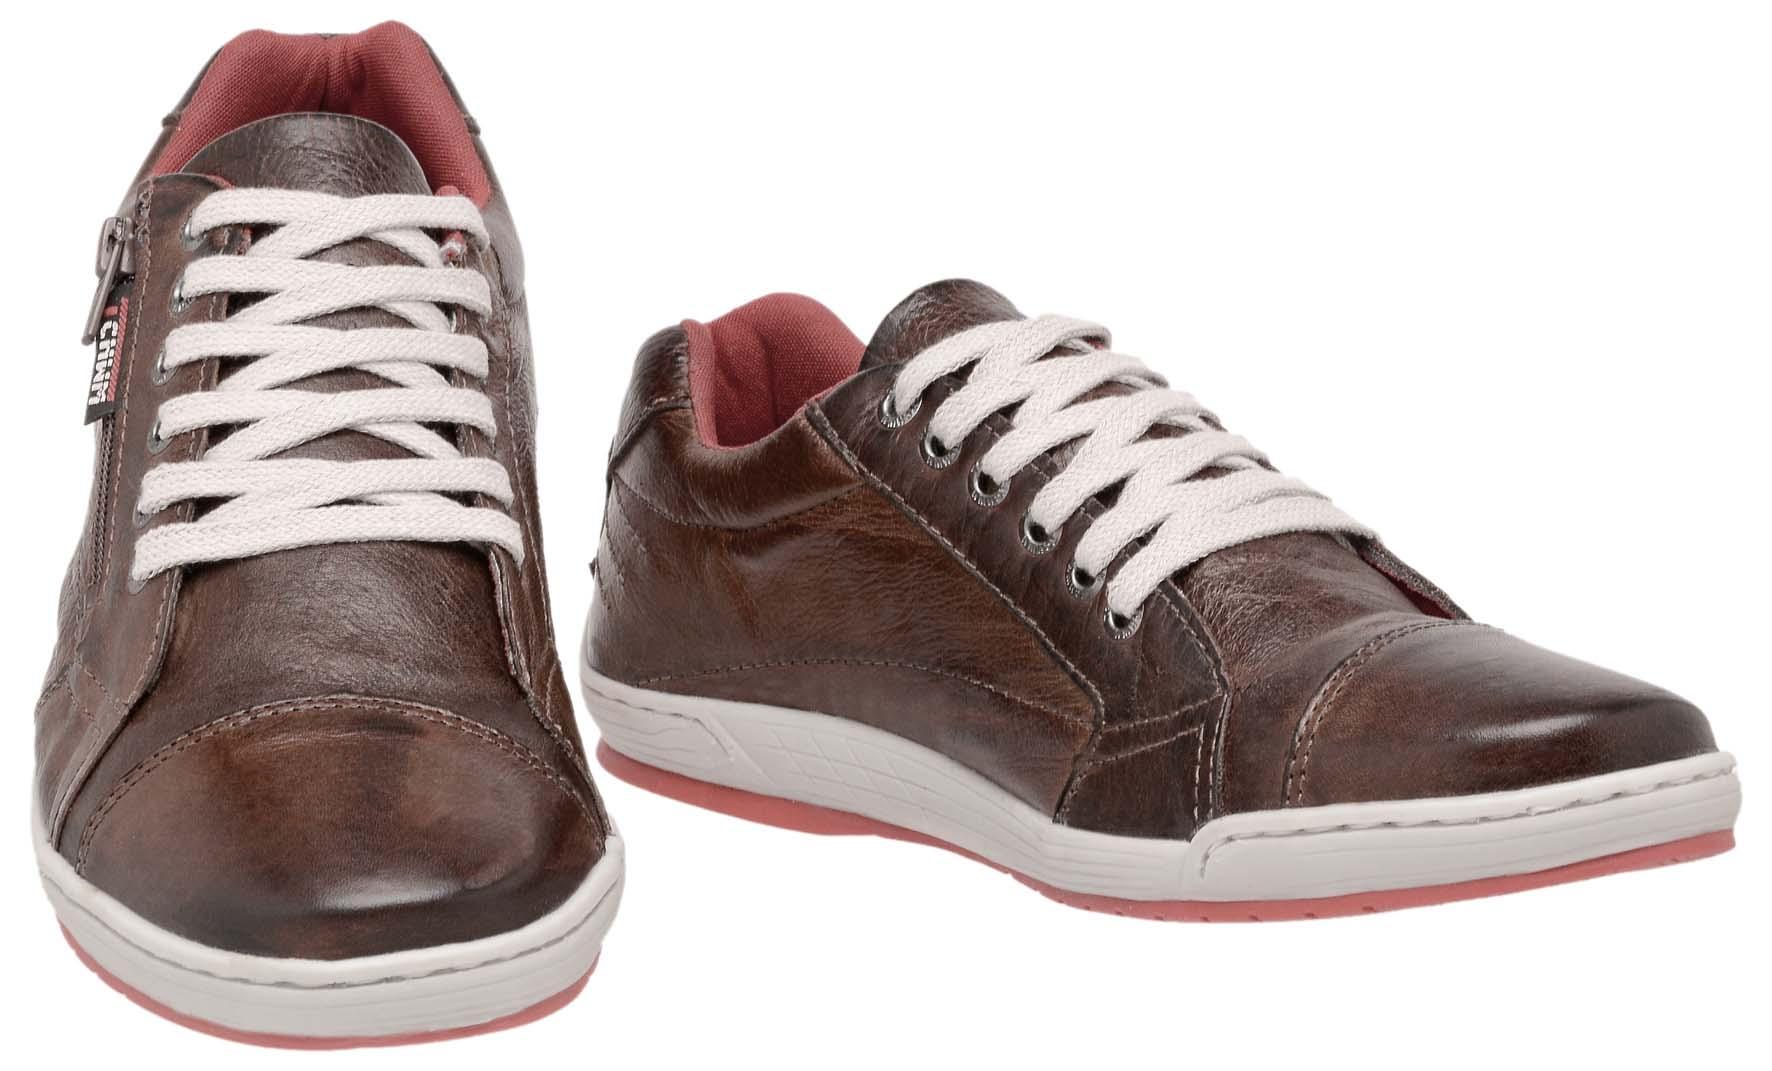 0c308877a0b32 ... Sapatênis Zíper Stilo Tchwm Shoes Couro Fóssil - Marrom - Madrid Outlet  ...